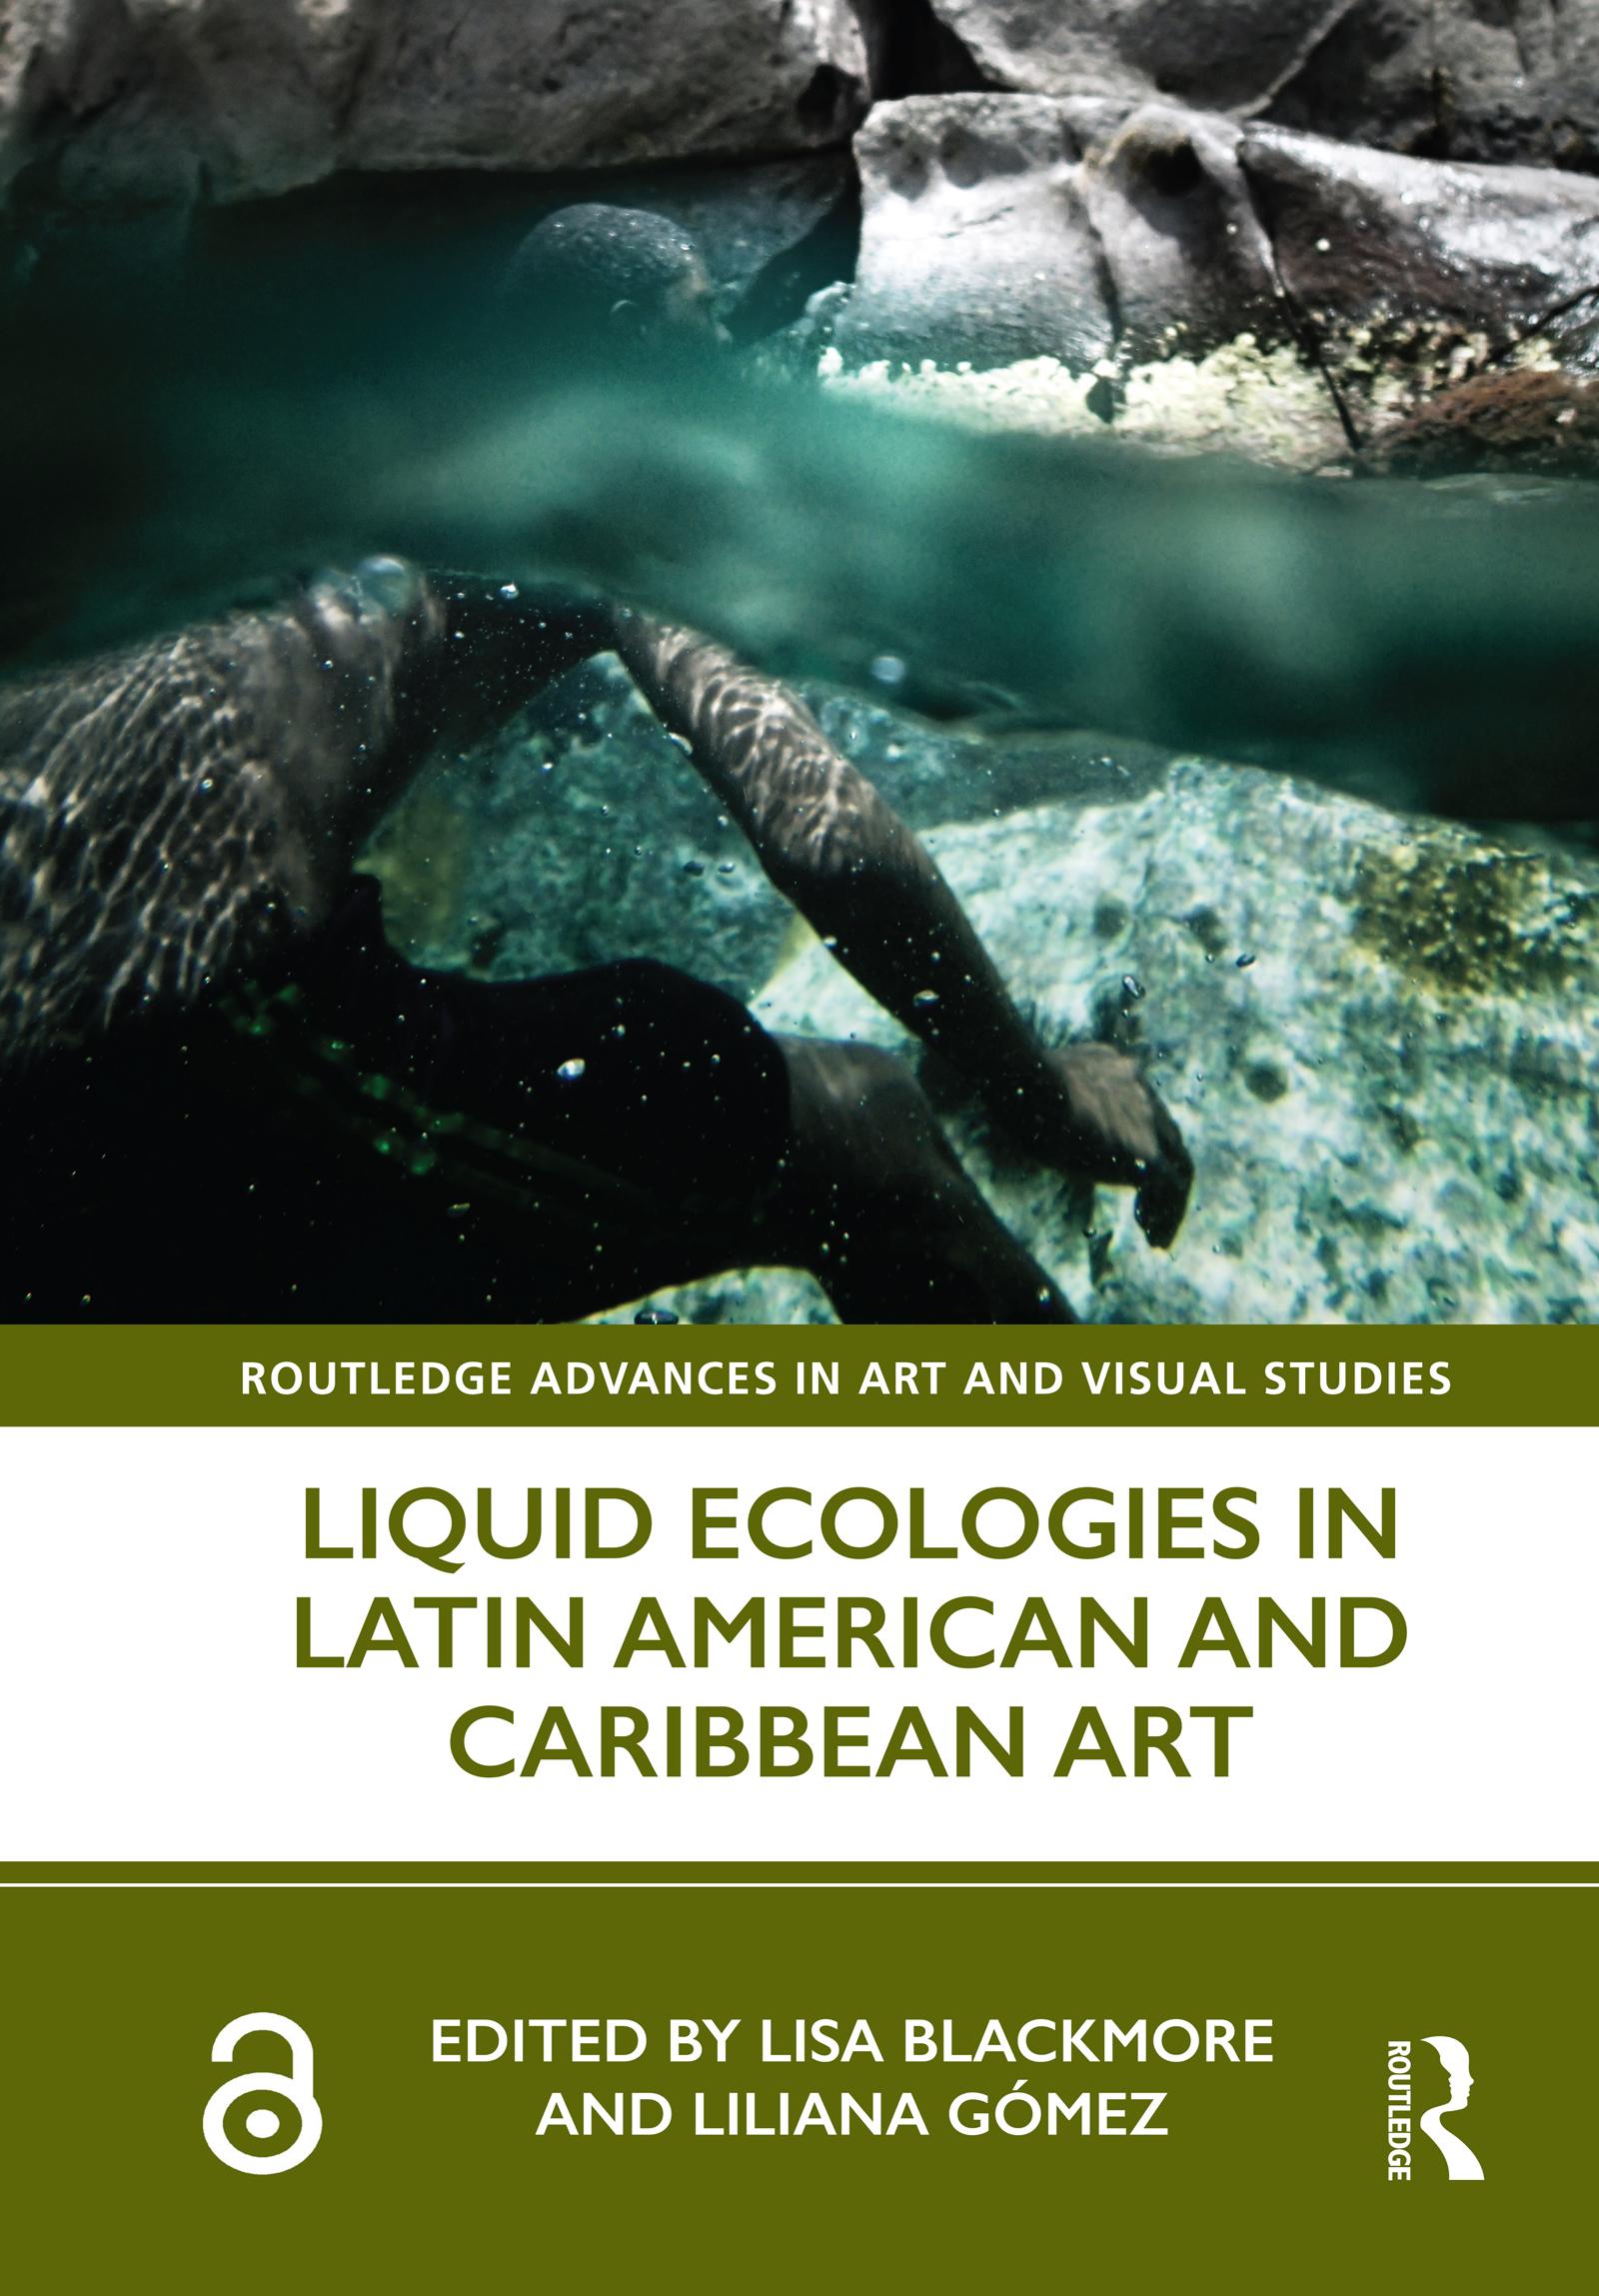 Liquid Ecologies in Latin American and Caribbean Art